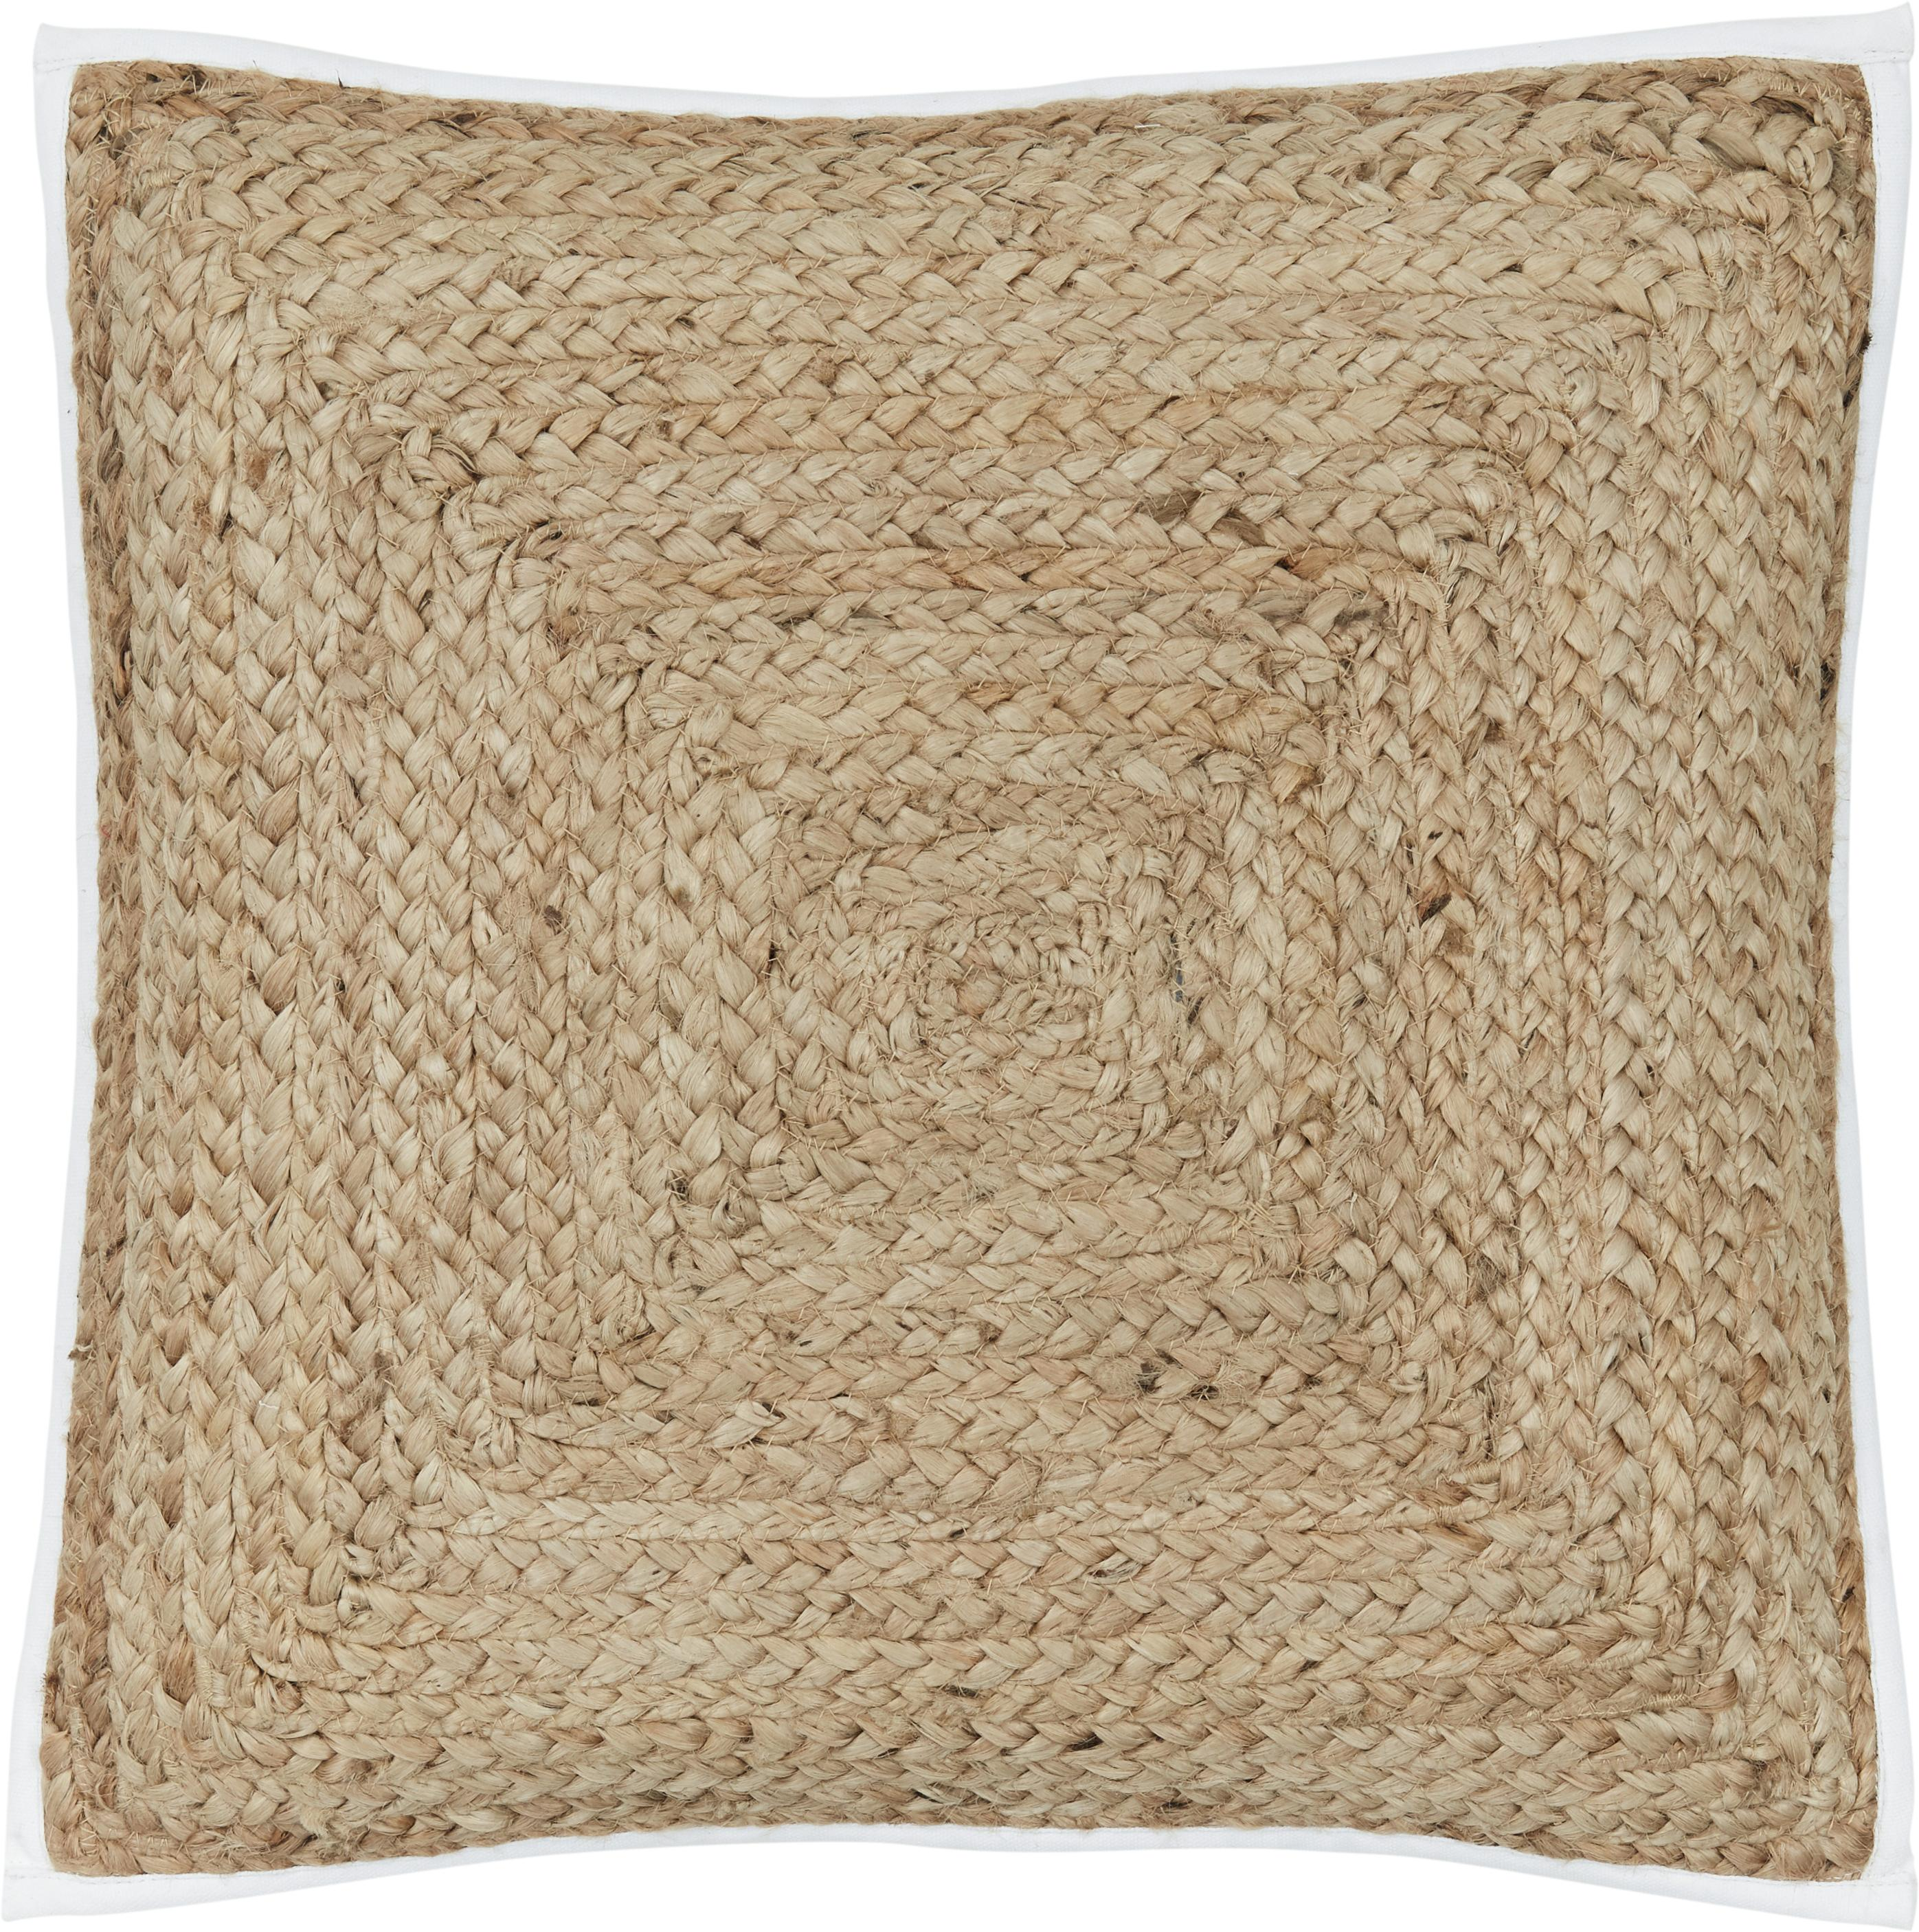 Funda de cojín de yute Justina, Parte superior: yute, Parte trasera: algodón, Beige, blanco, An 45 x L 45 cm